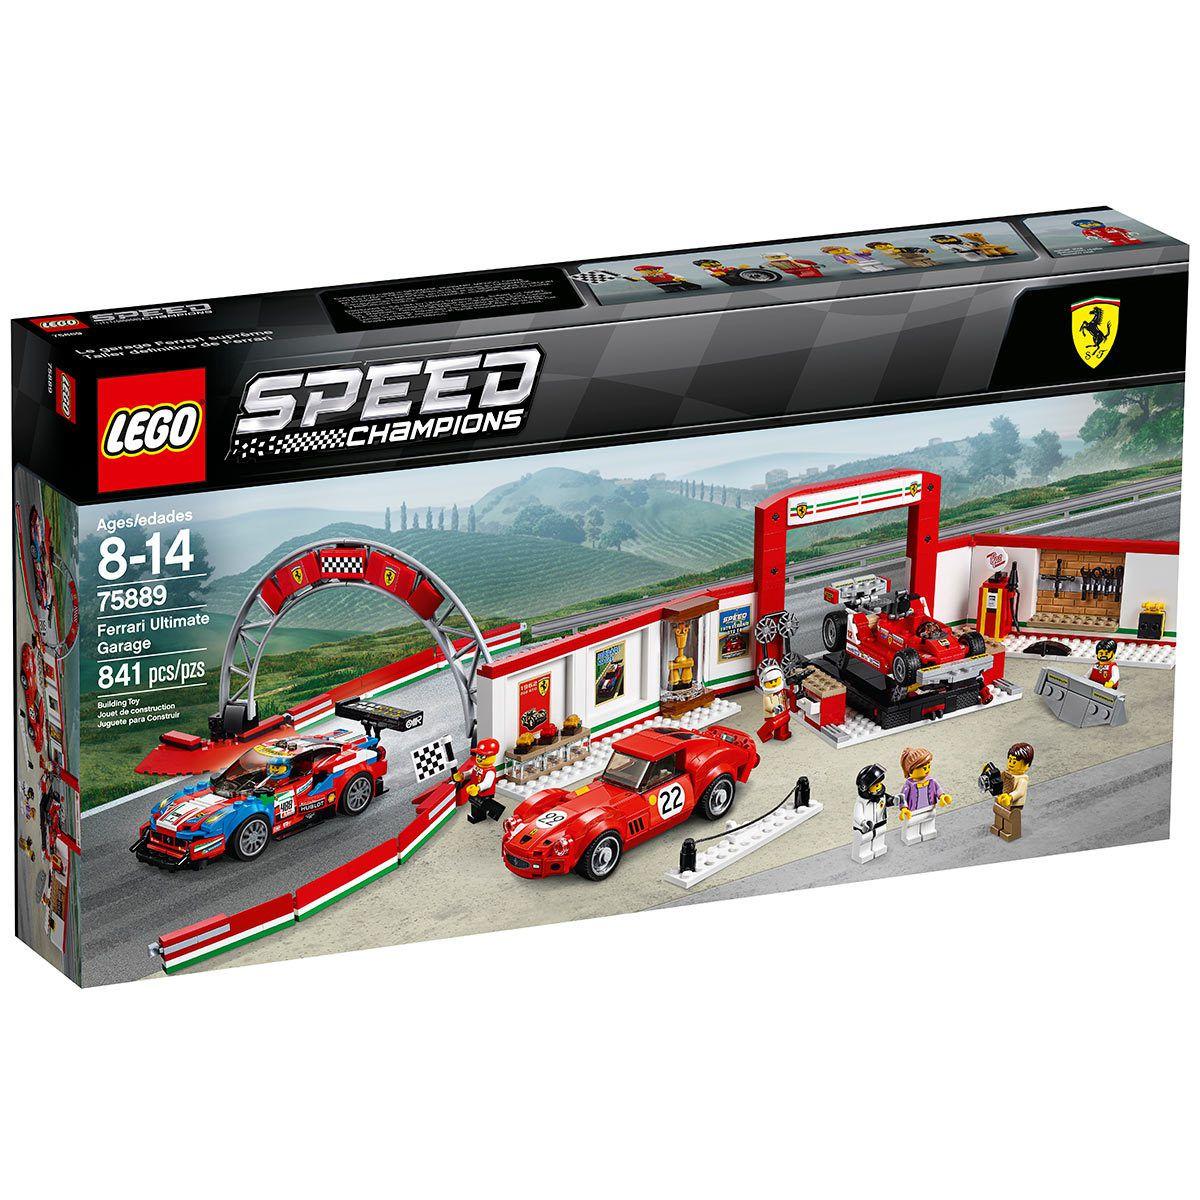 Lego Speed Champions 75889 Garagem Ferrari Ultimate